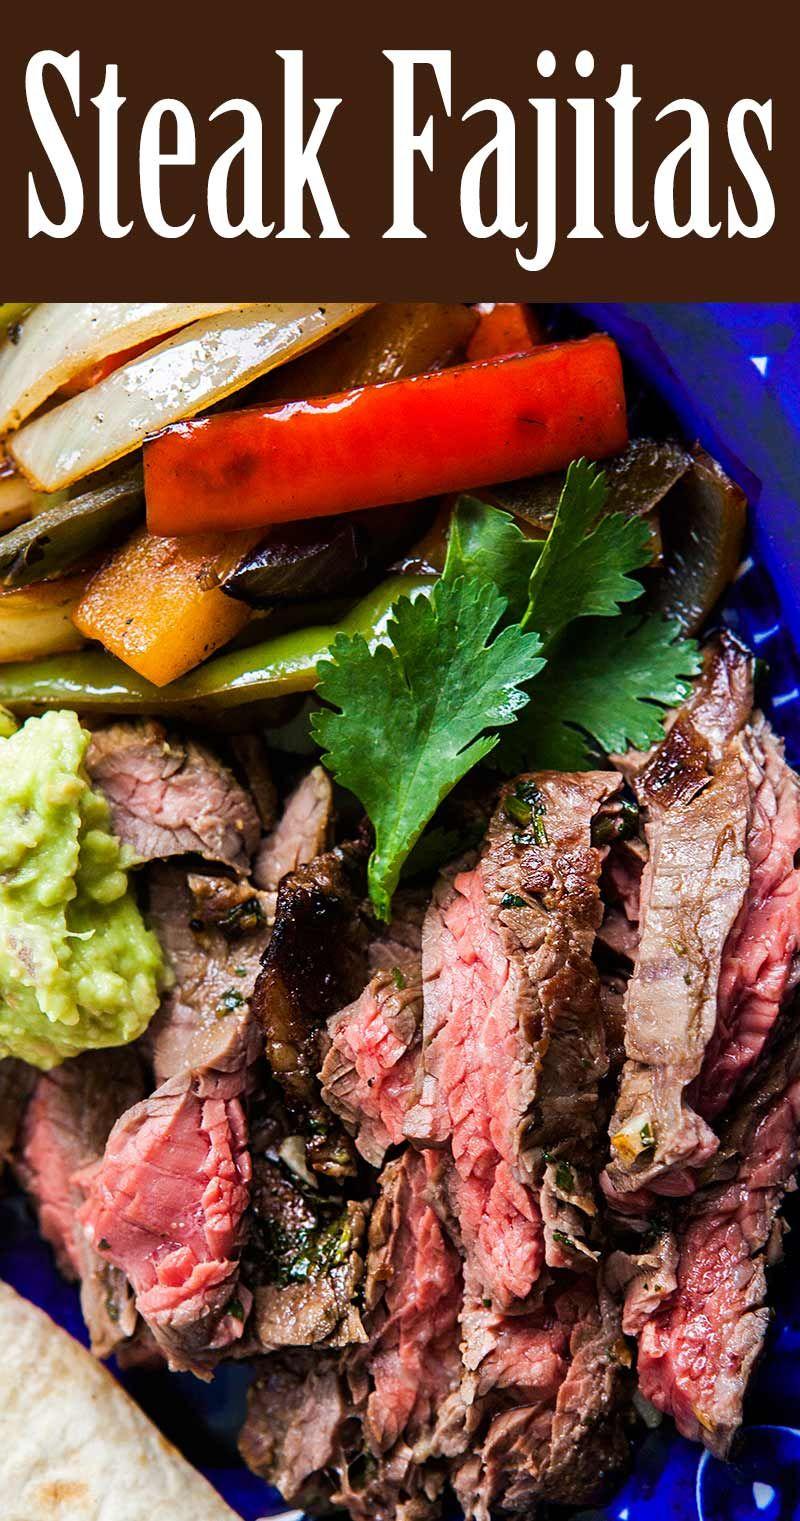 Beef Steak Fajitas #steakfajitarecipe